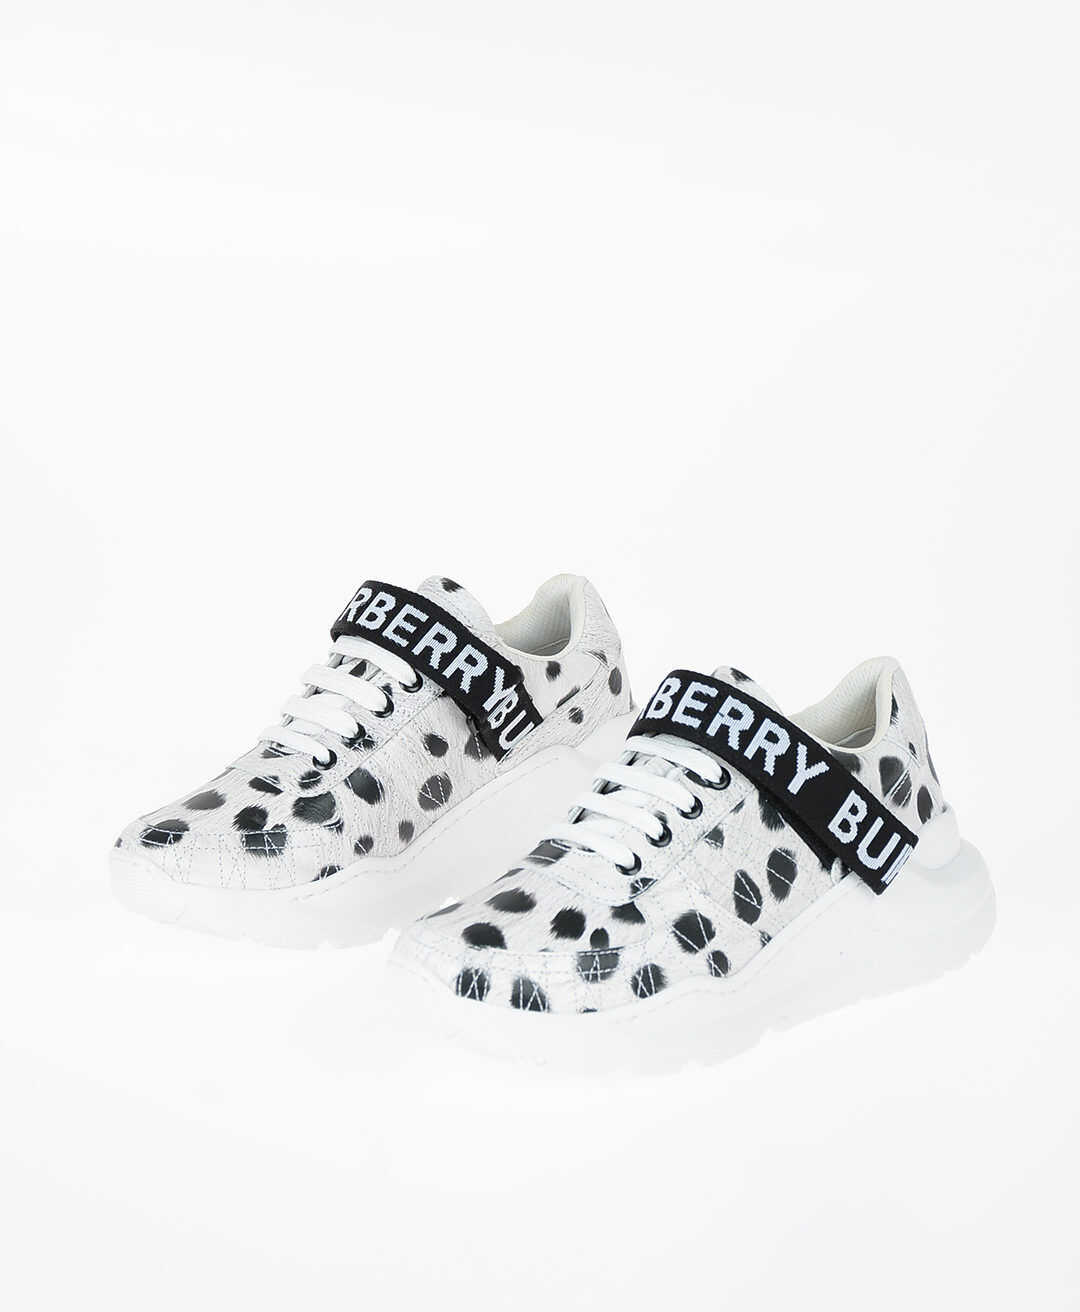 Burberry Animal Printed RONNIE ZIG Sneakers BLACK & WHITE